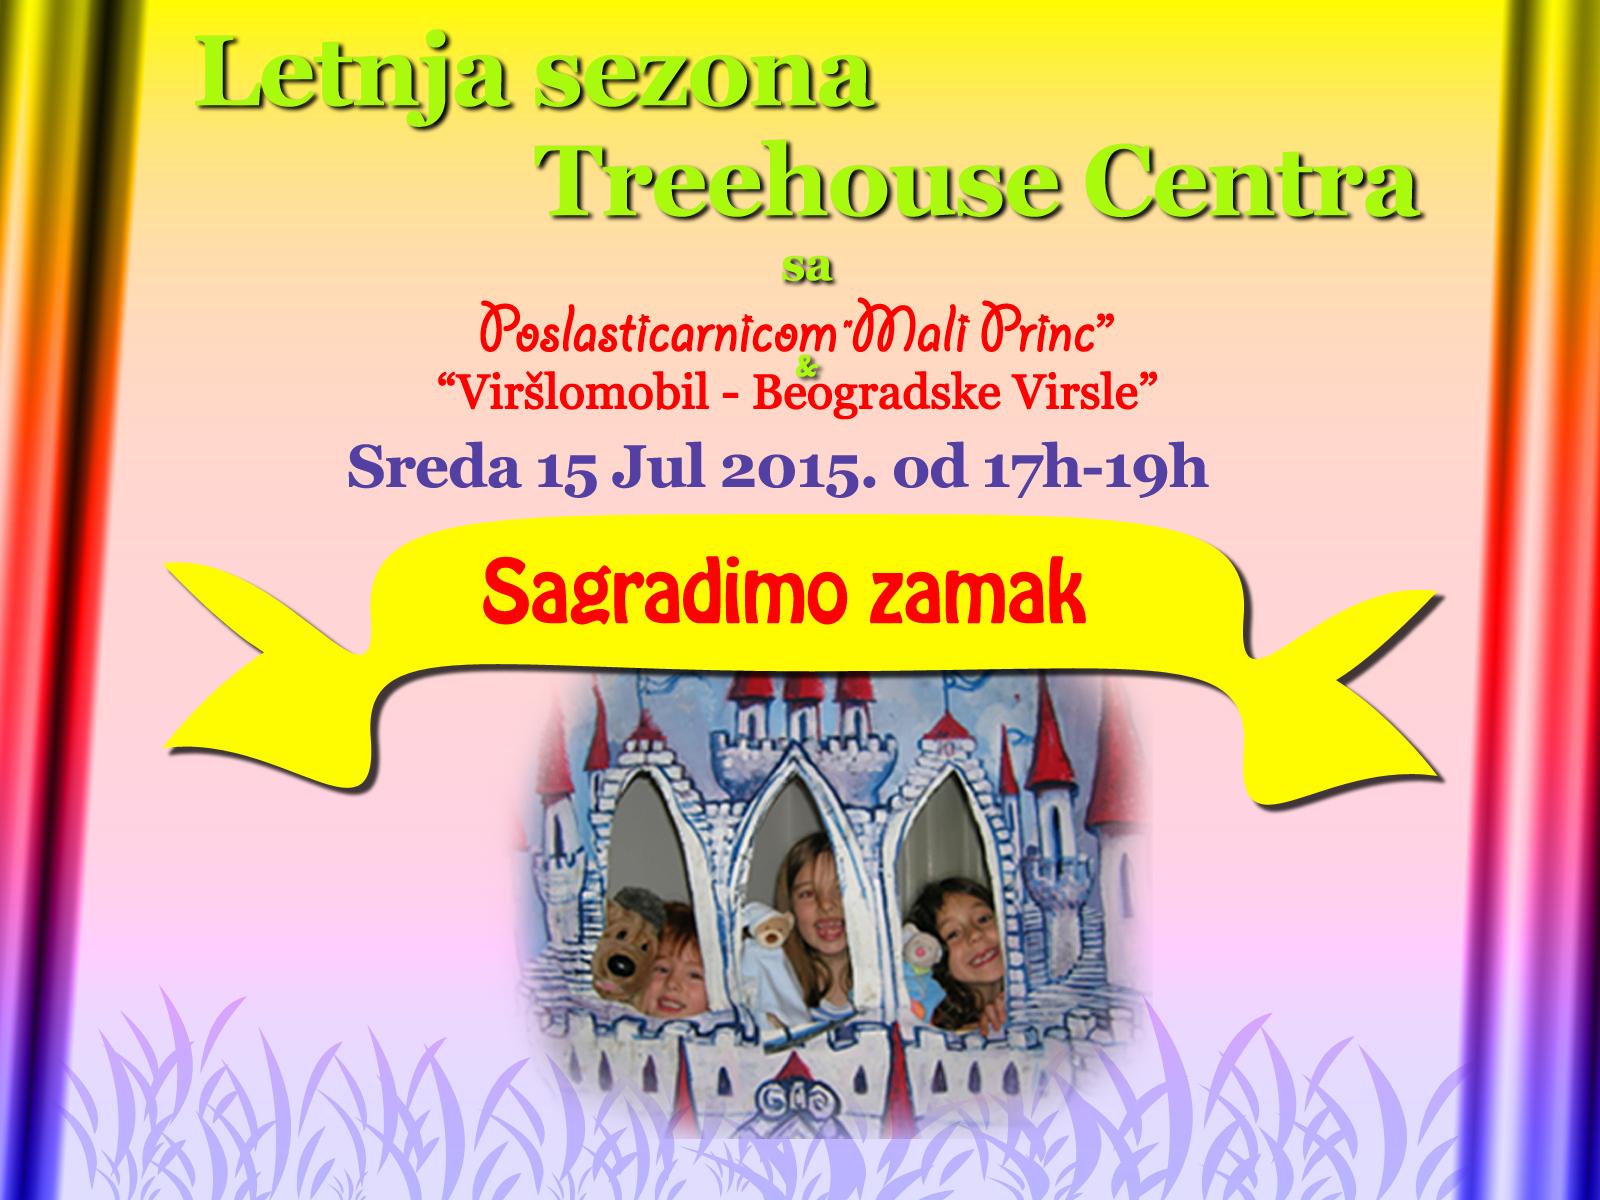 http://www.treehousesc.com/wp-content/uploads/2015/07/zamak-s.jpg